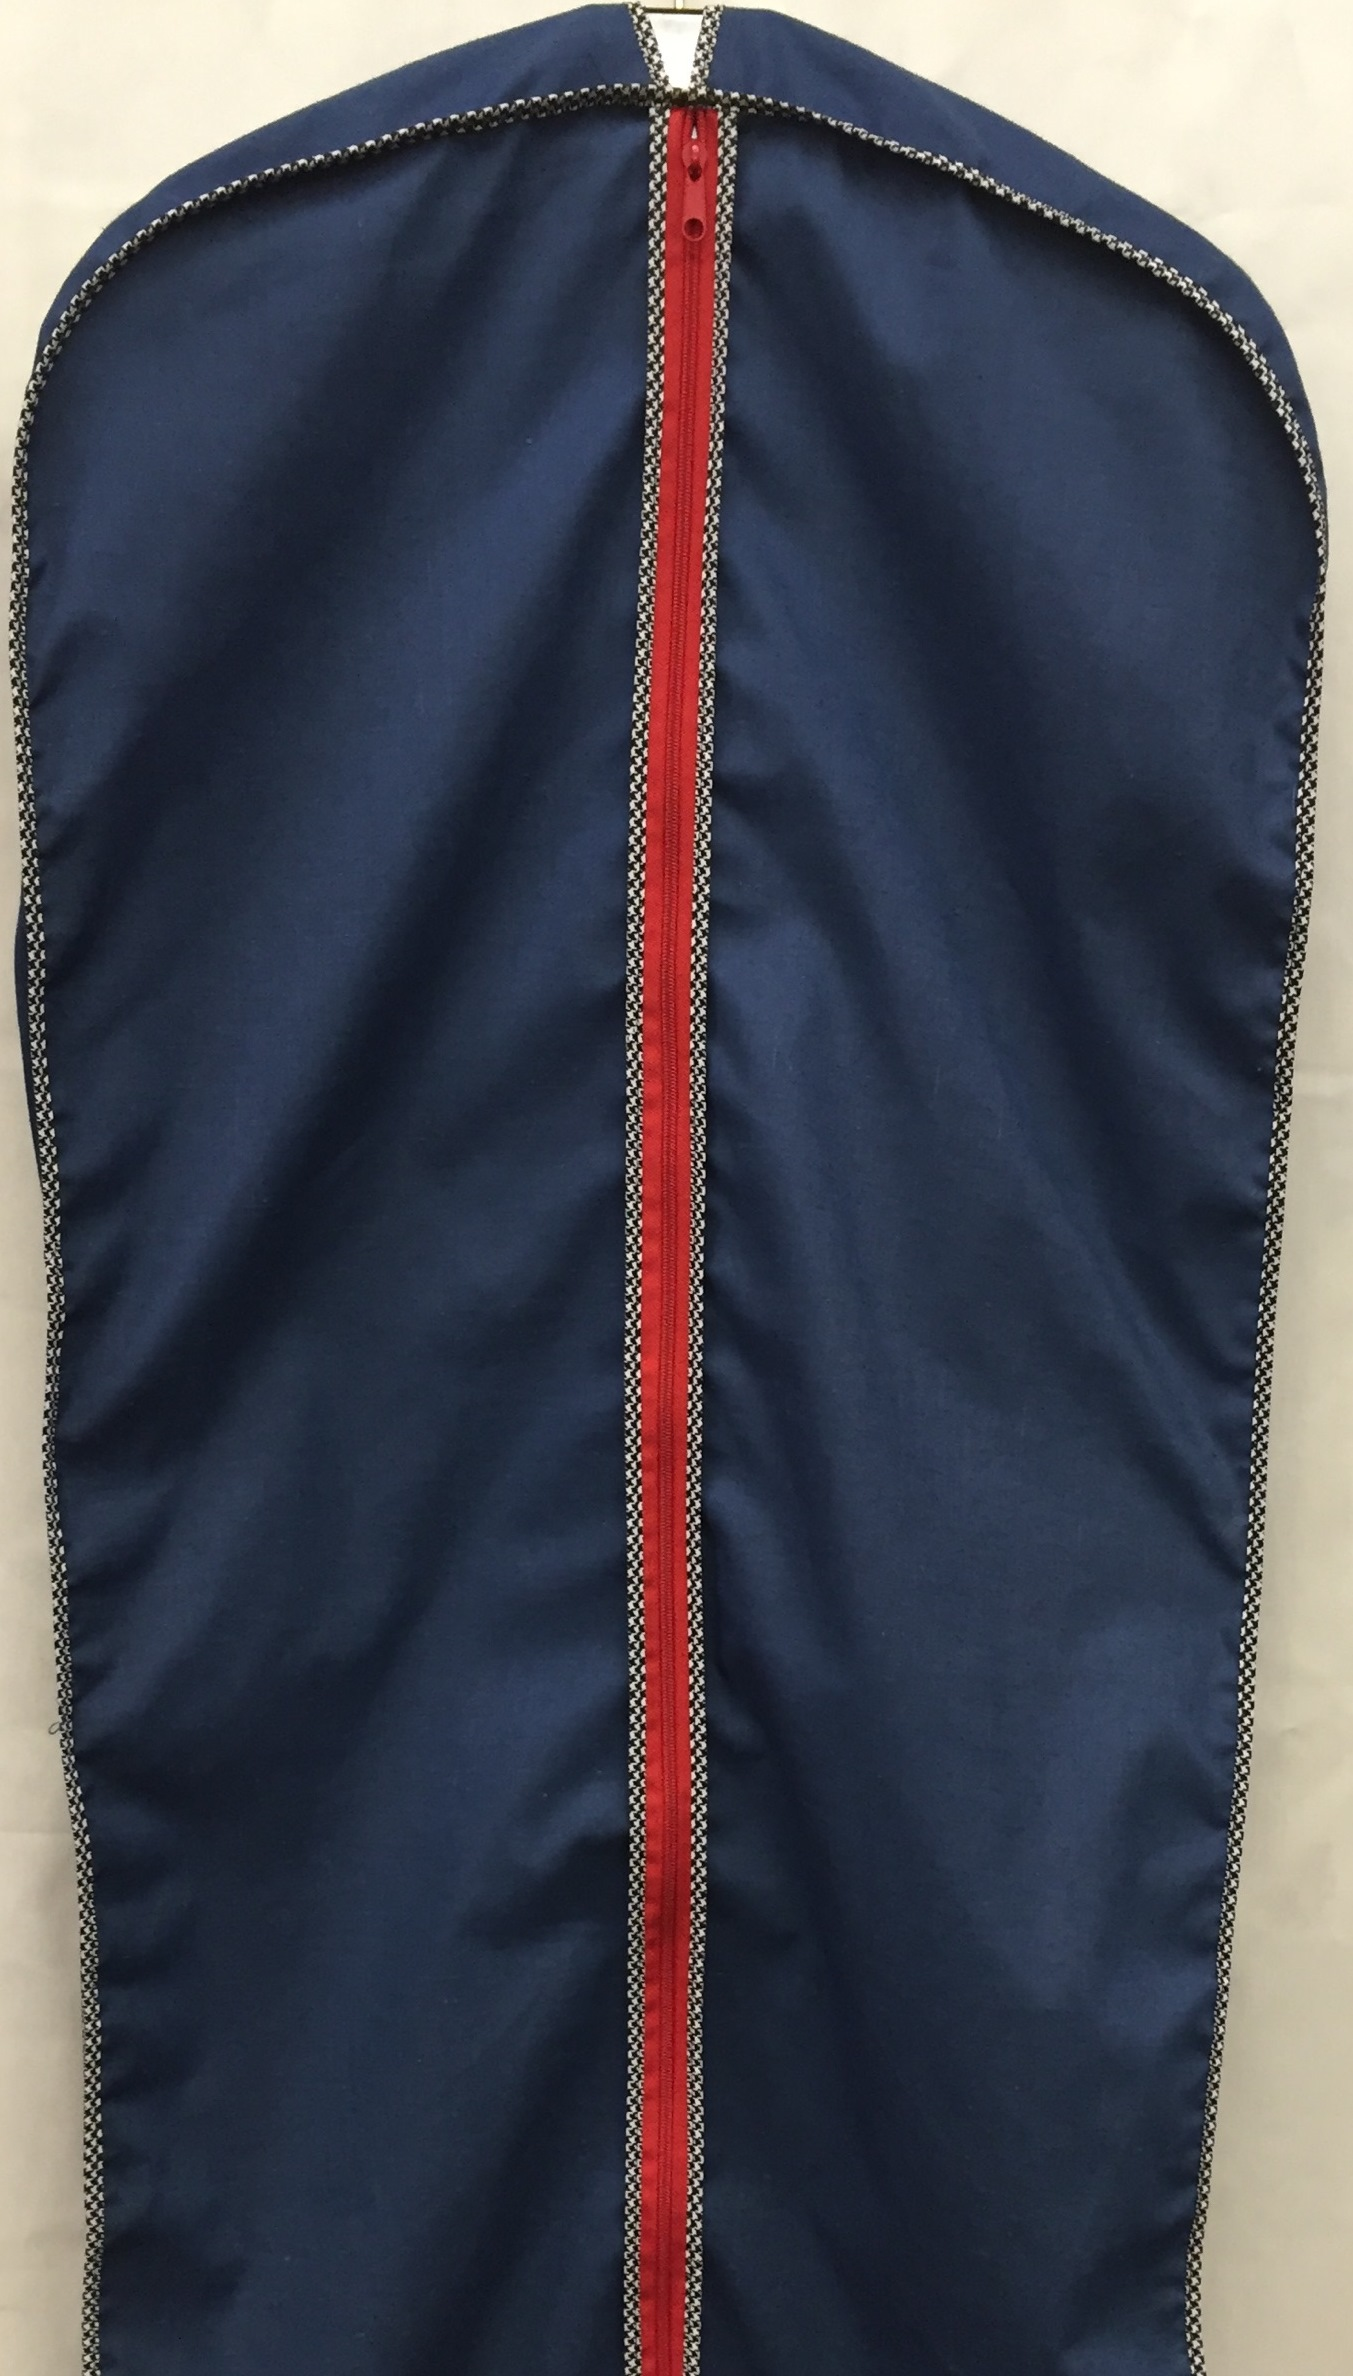 Basic Ltd Breathable Suit And Dress Garment Bags